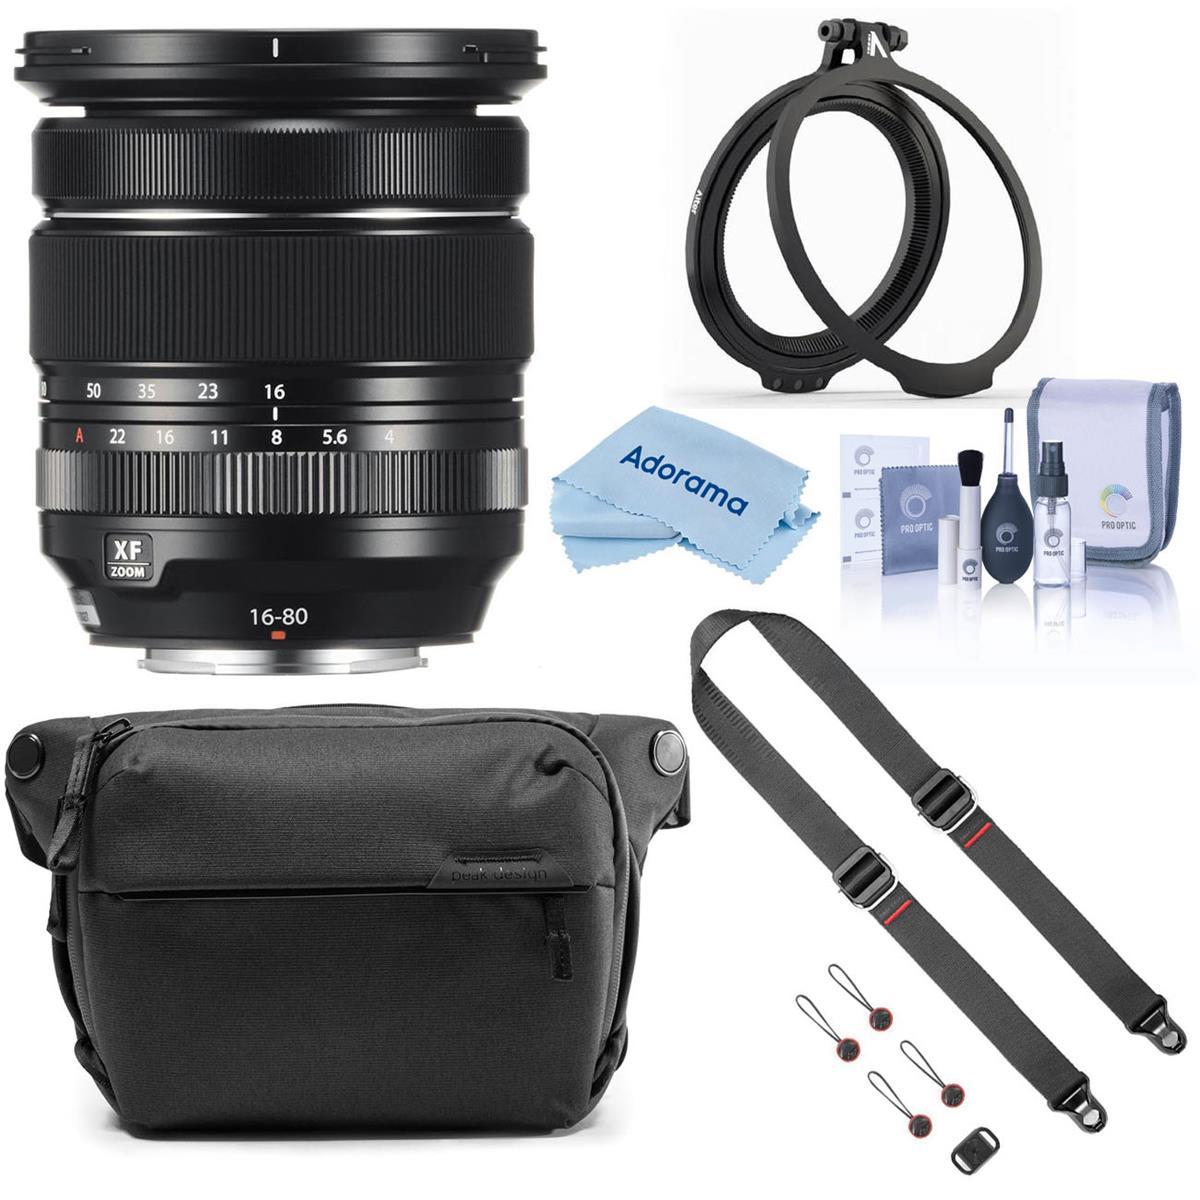 Fujifilm XF 16-80mm f/4.0 R OIS WR Lens Bundle with Peak Design Accessories